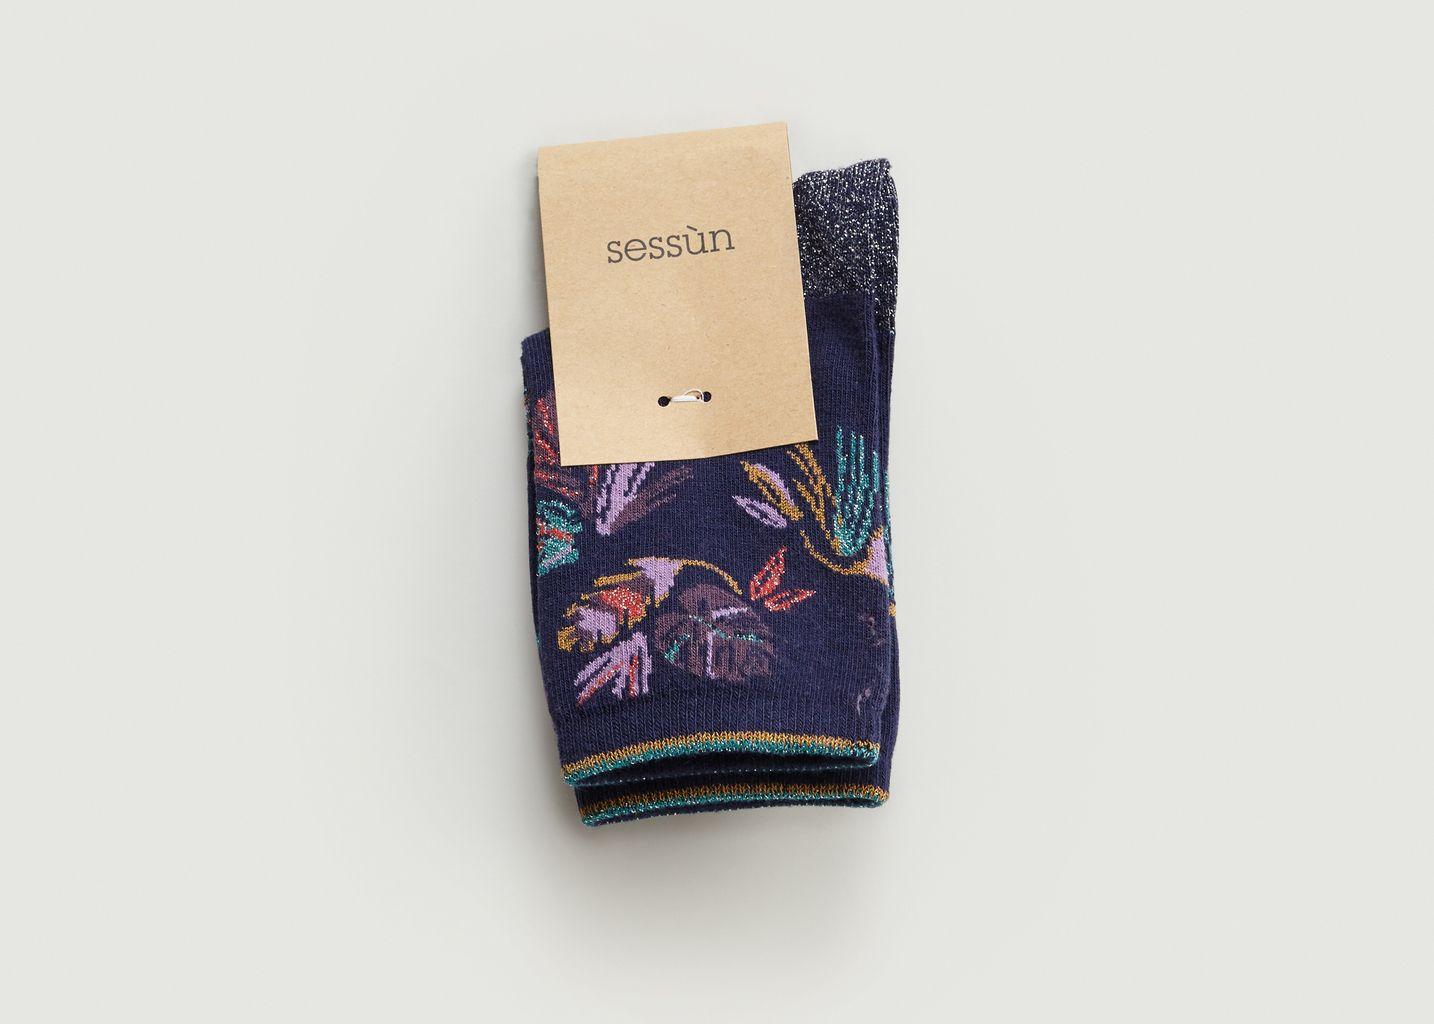 Chaussettes Mahoeta - Sessun